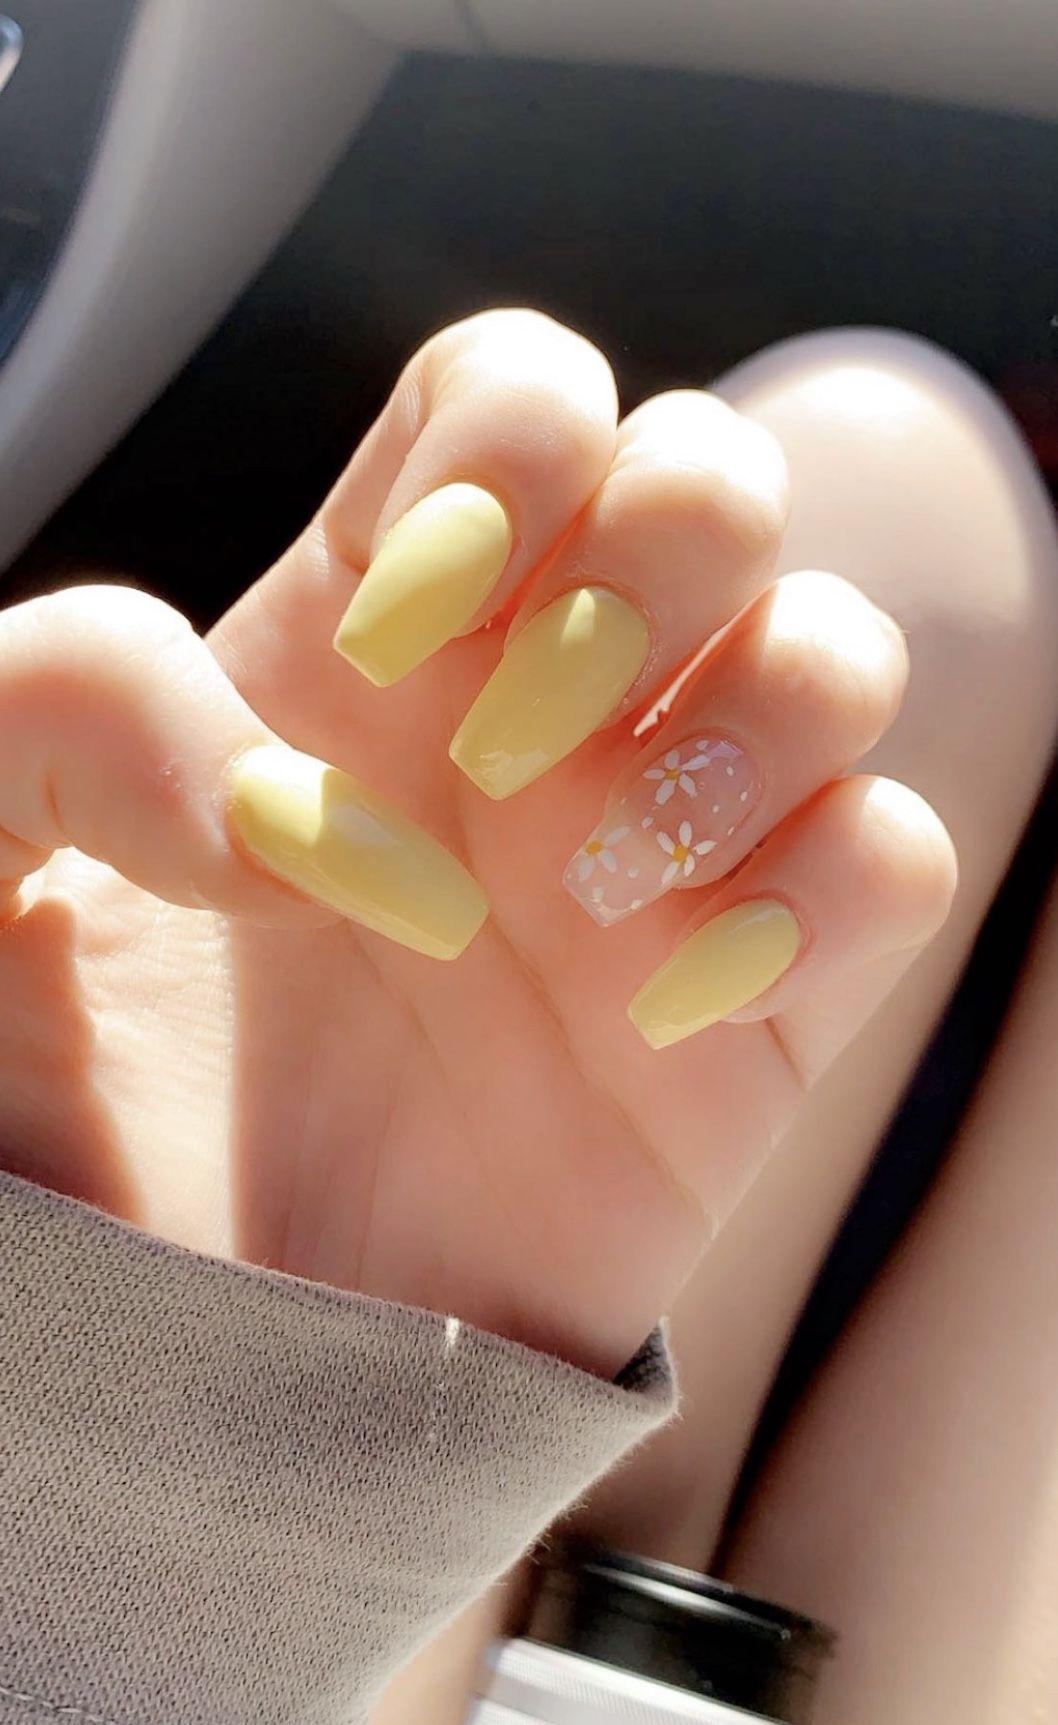 Pin By Aneta Chodzajanova On Nails In 2020 With Images Gelove Nehty Akrylove Nehty Nehty